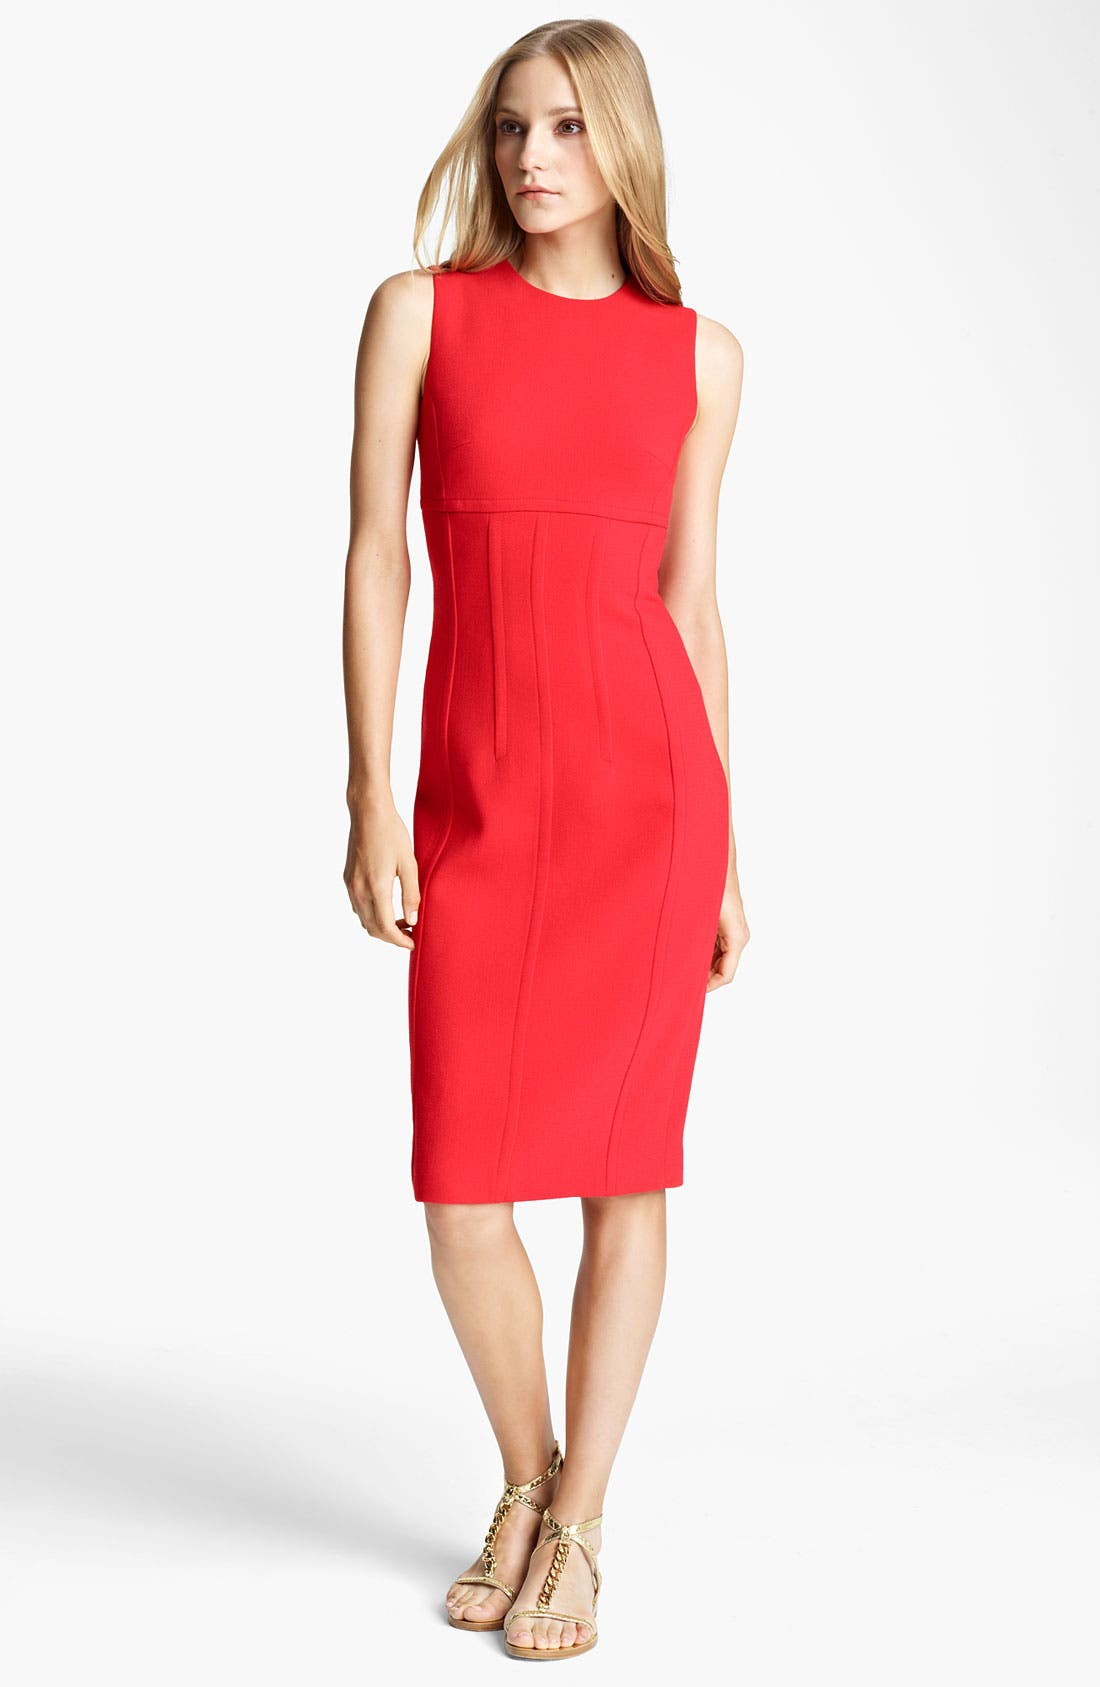 Alternate Image 1 Selected - Michael Kors Seamed Bouclé Sheath Dress